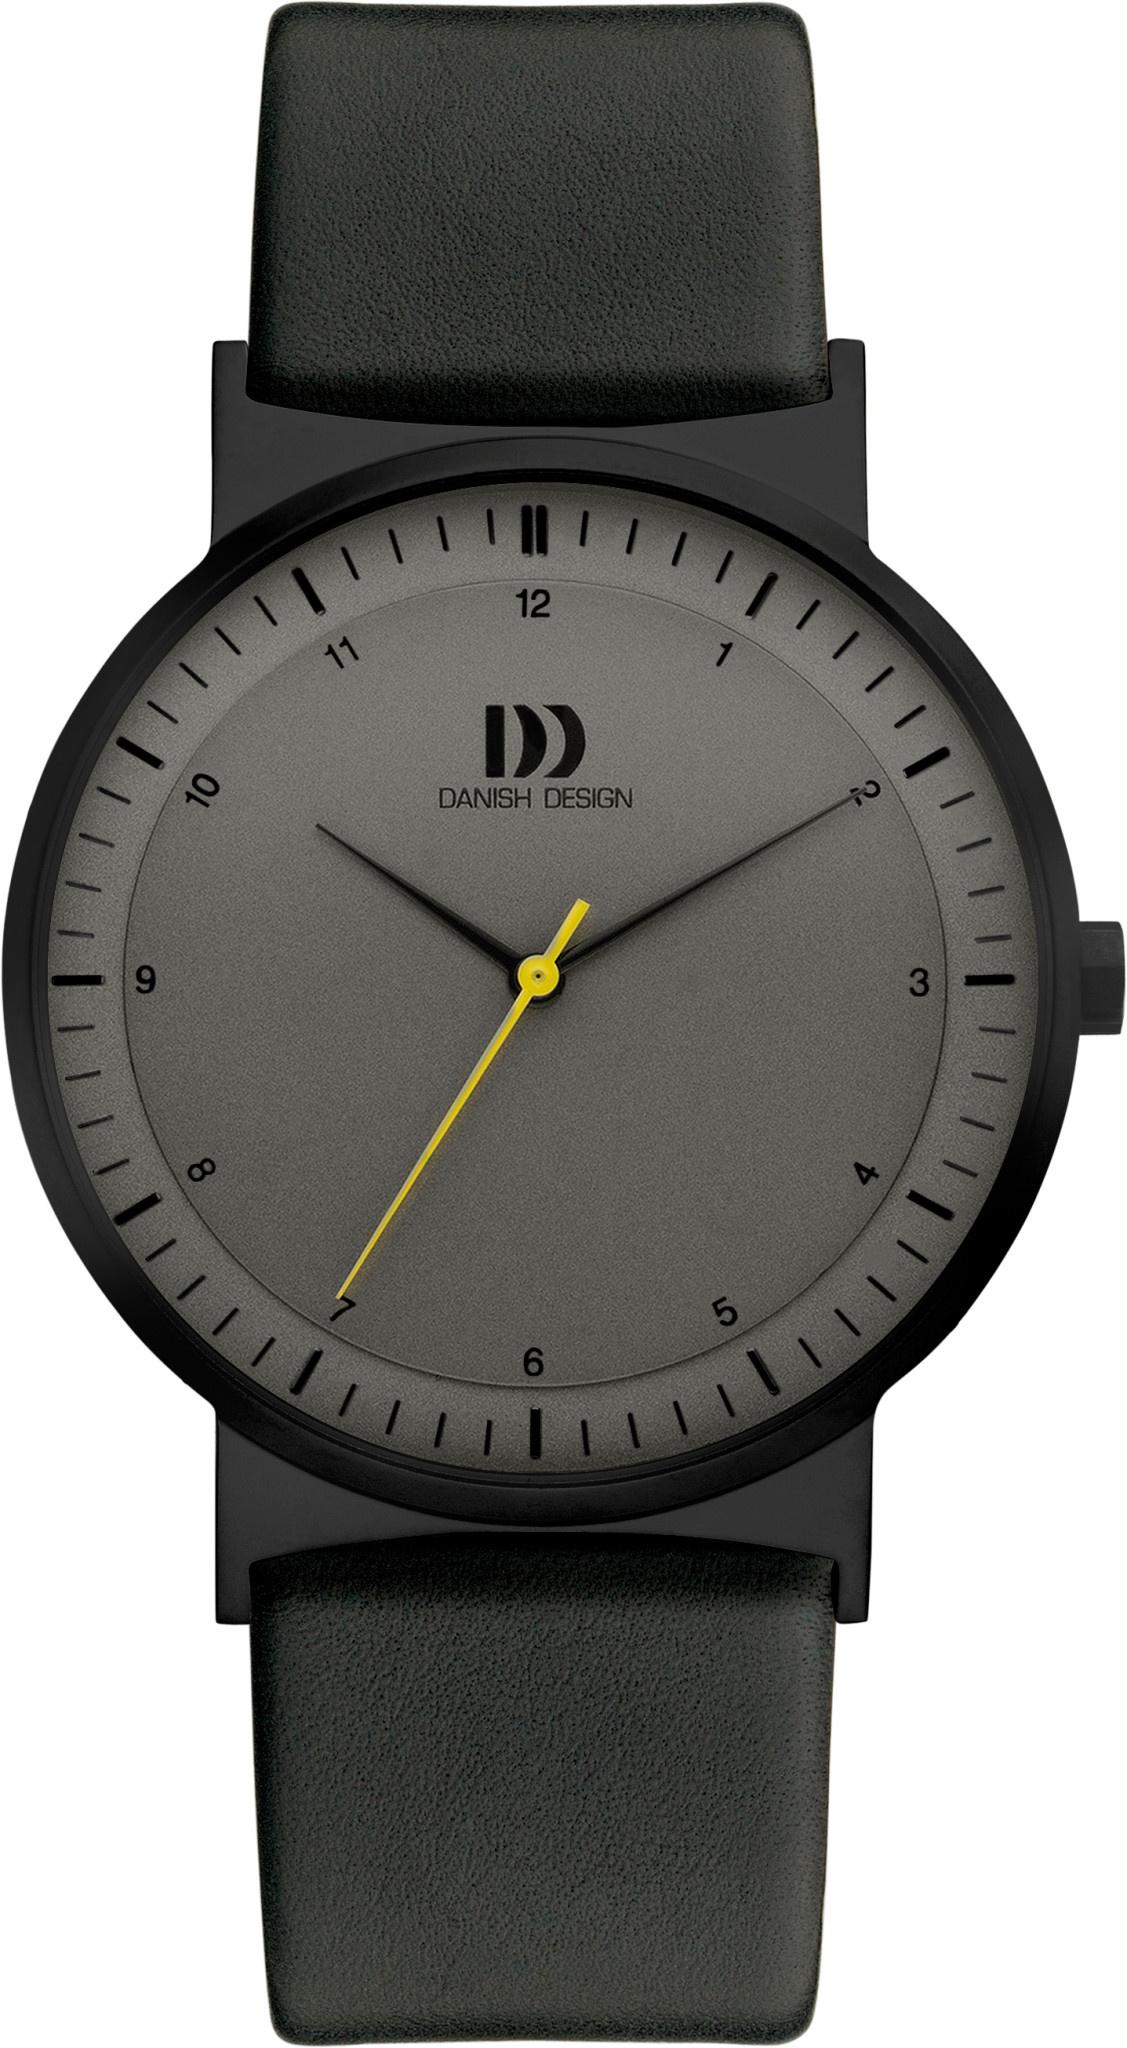 Danish Design Stainless Steel Watch Iq16Q1189 Designed By Jan Egeberg-2